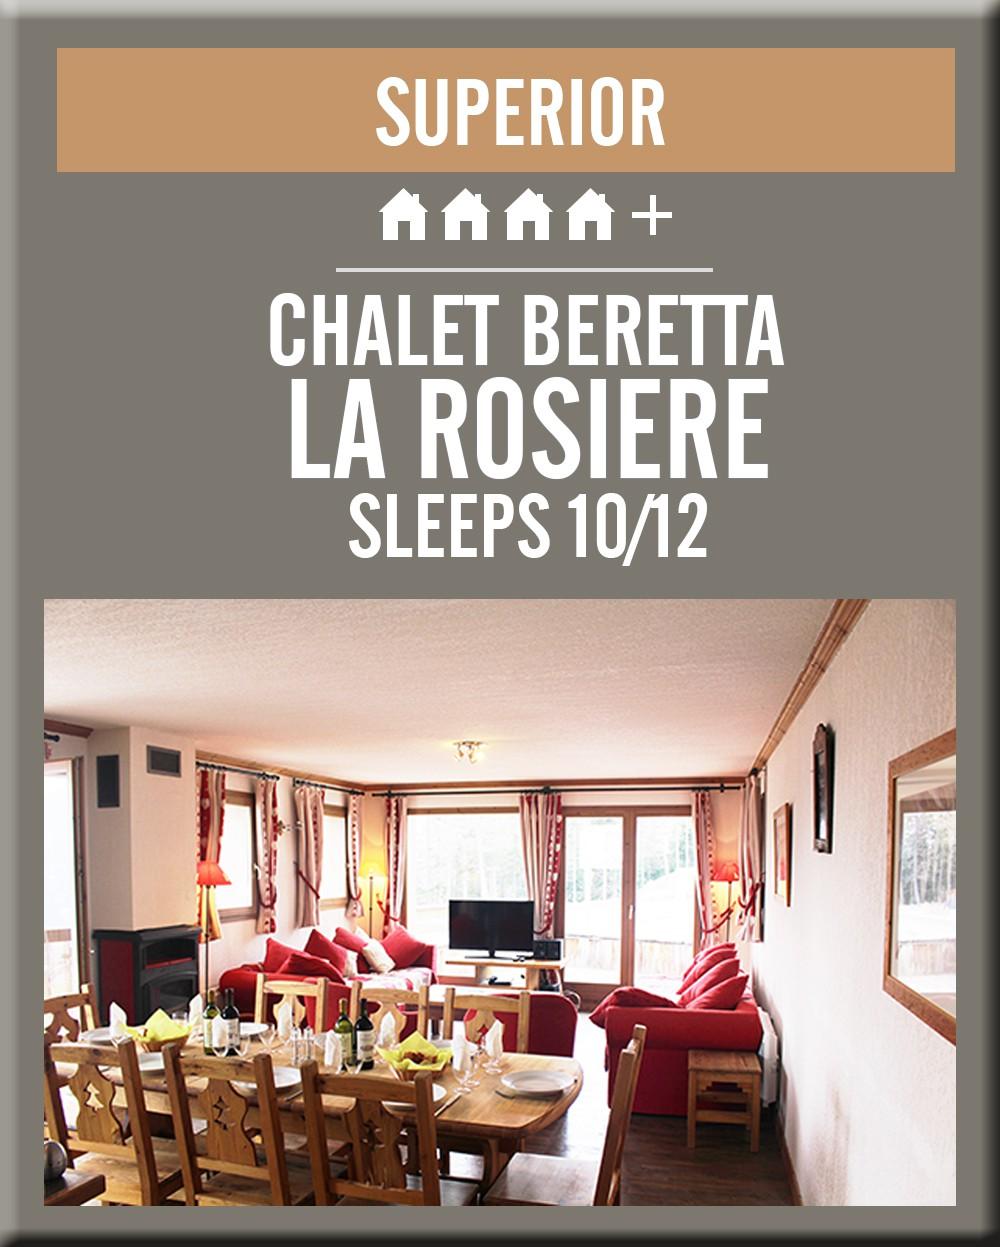 France chalet beretta la rosiere dining room